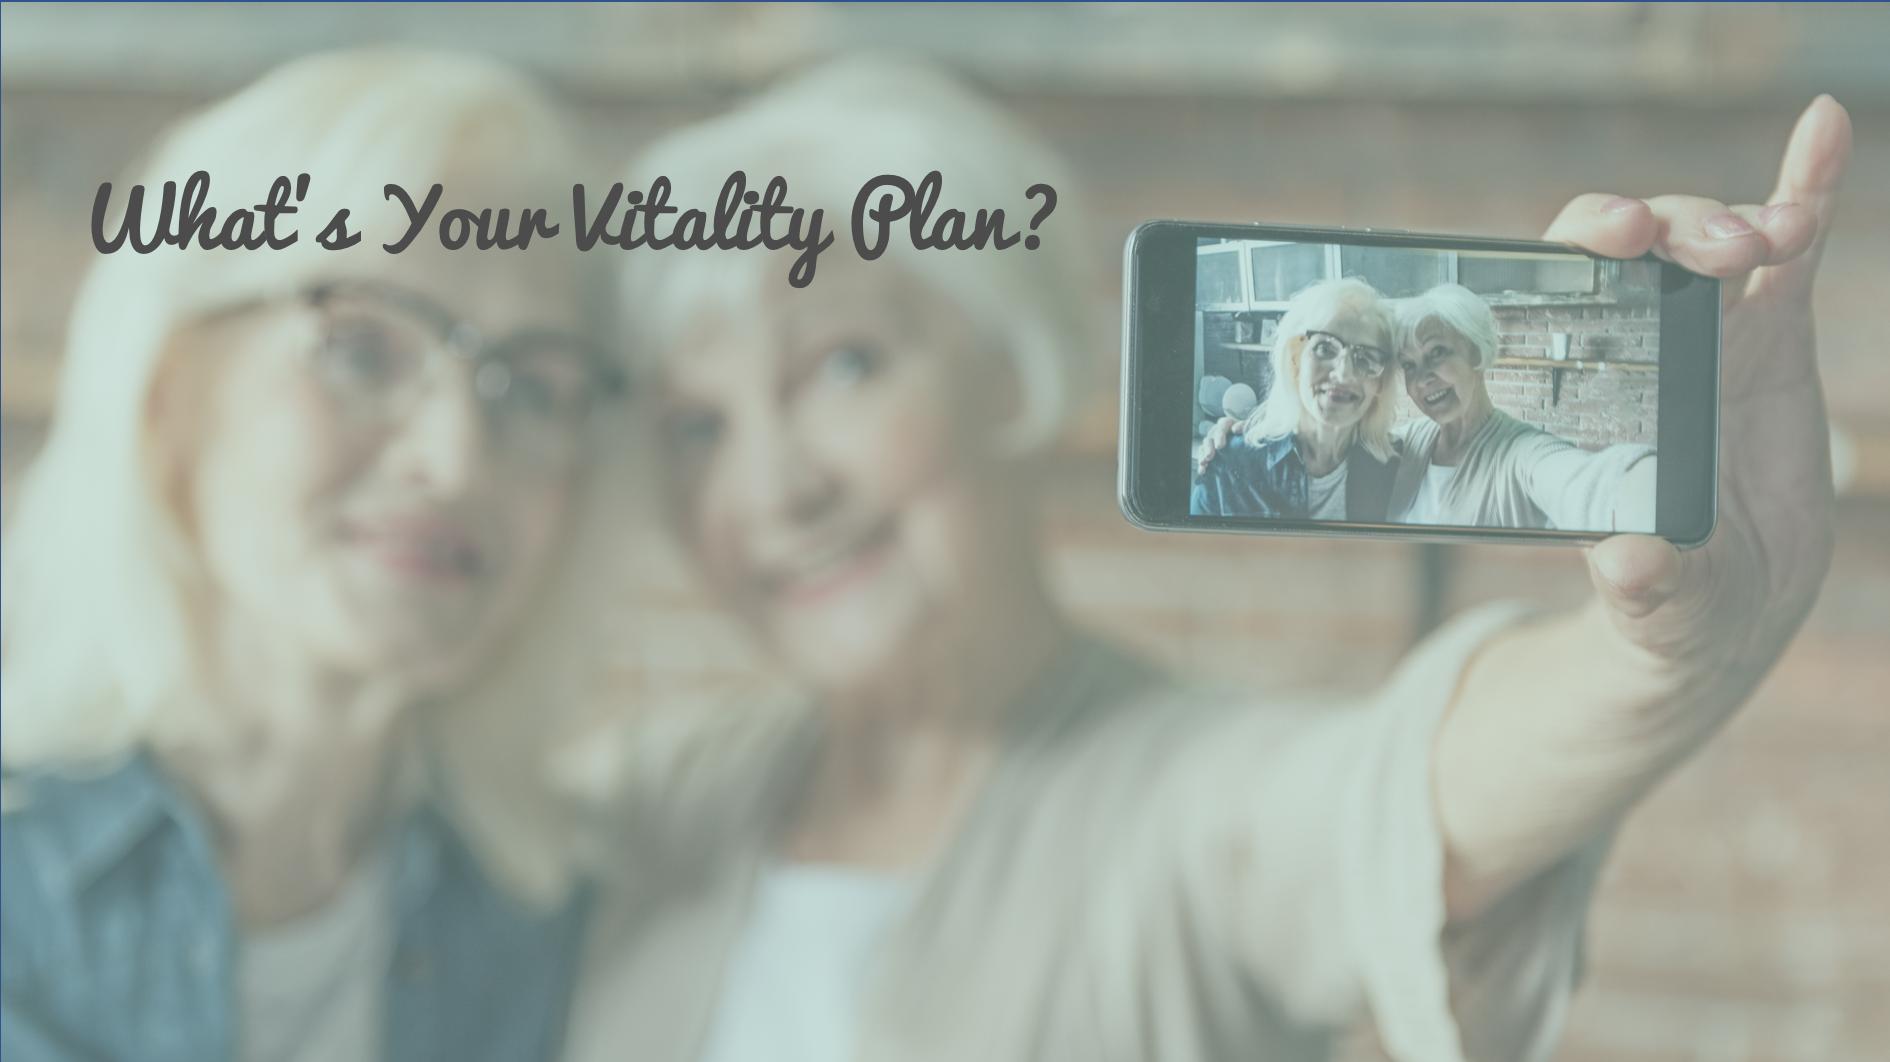 Blog - Whats Your Vitality Plan